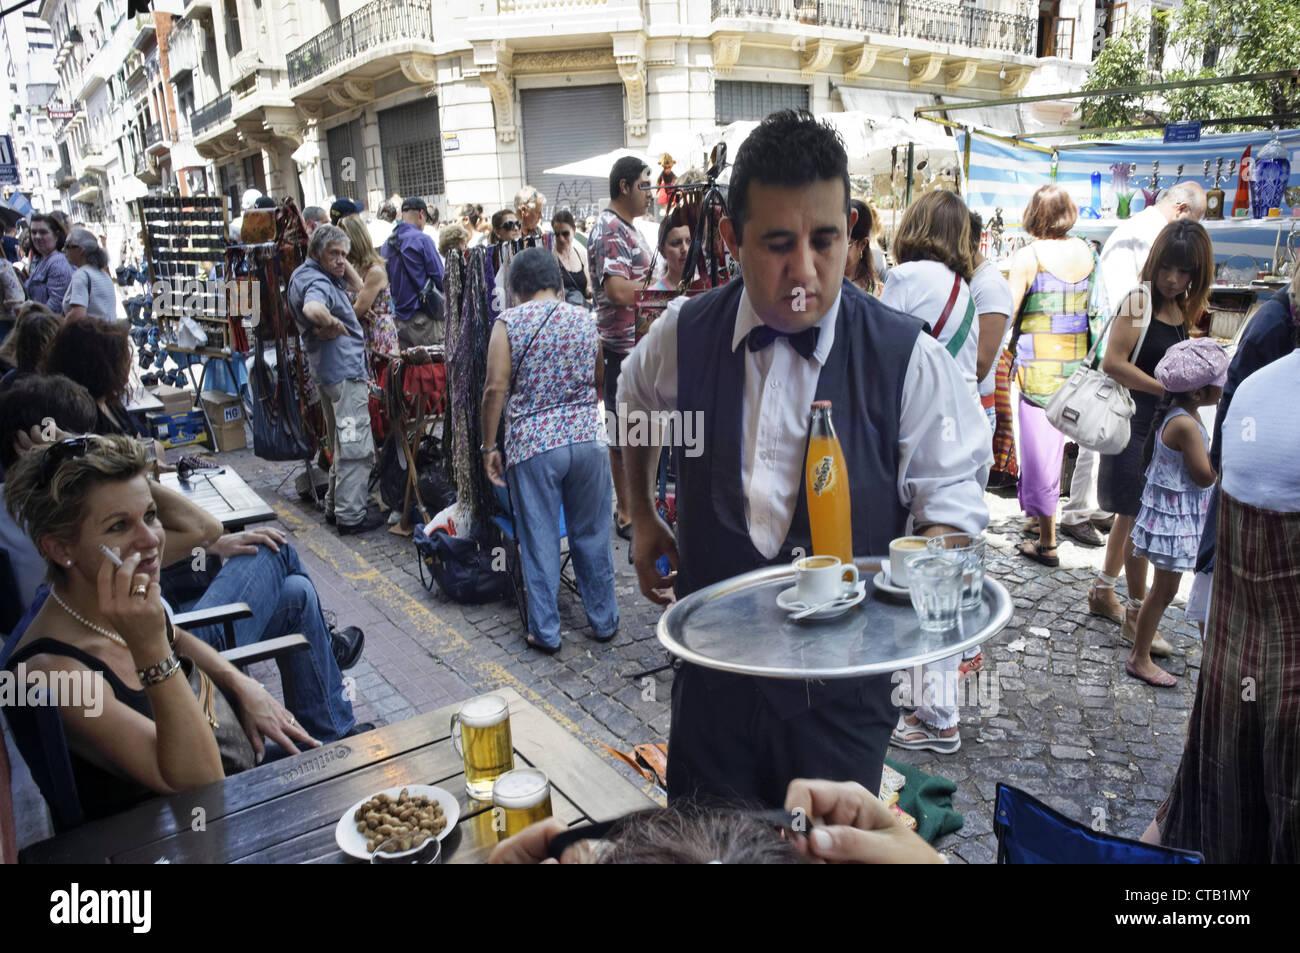 Waiter with tray, Bar, Plaza Dorrego, San Telmo, Buenos Aires, Argentina - Stock Image